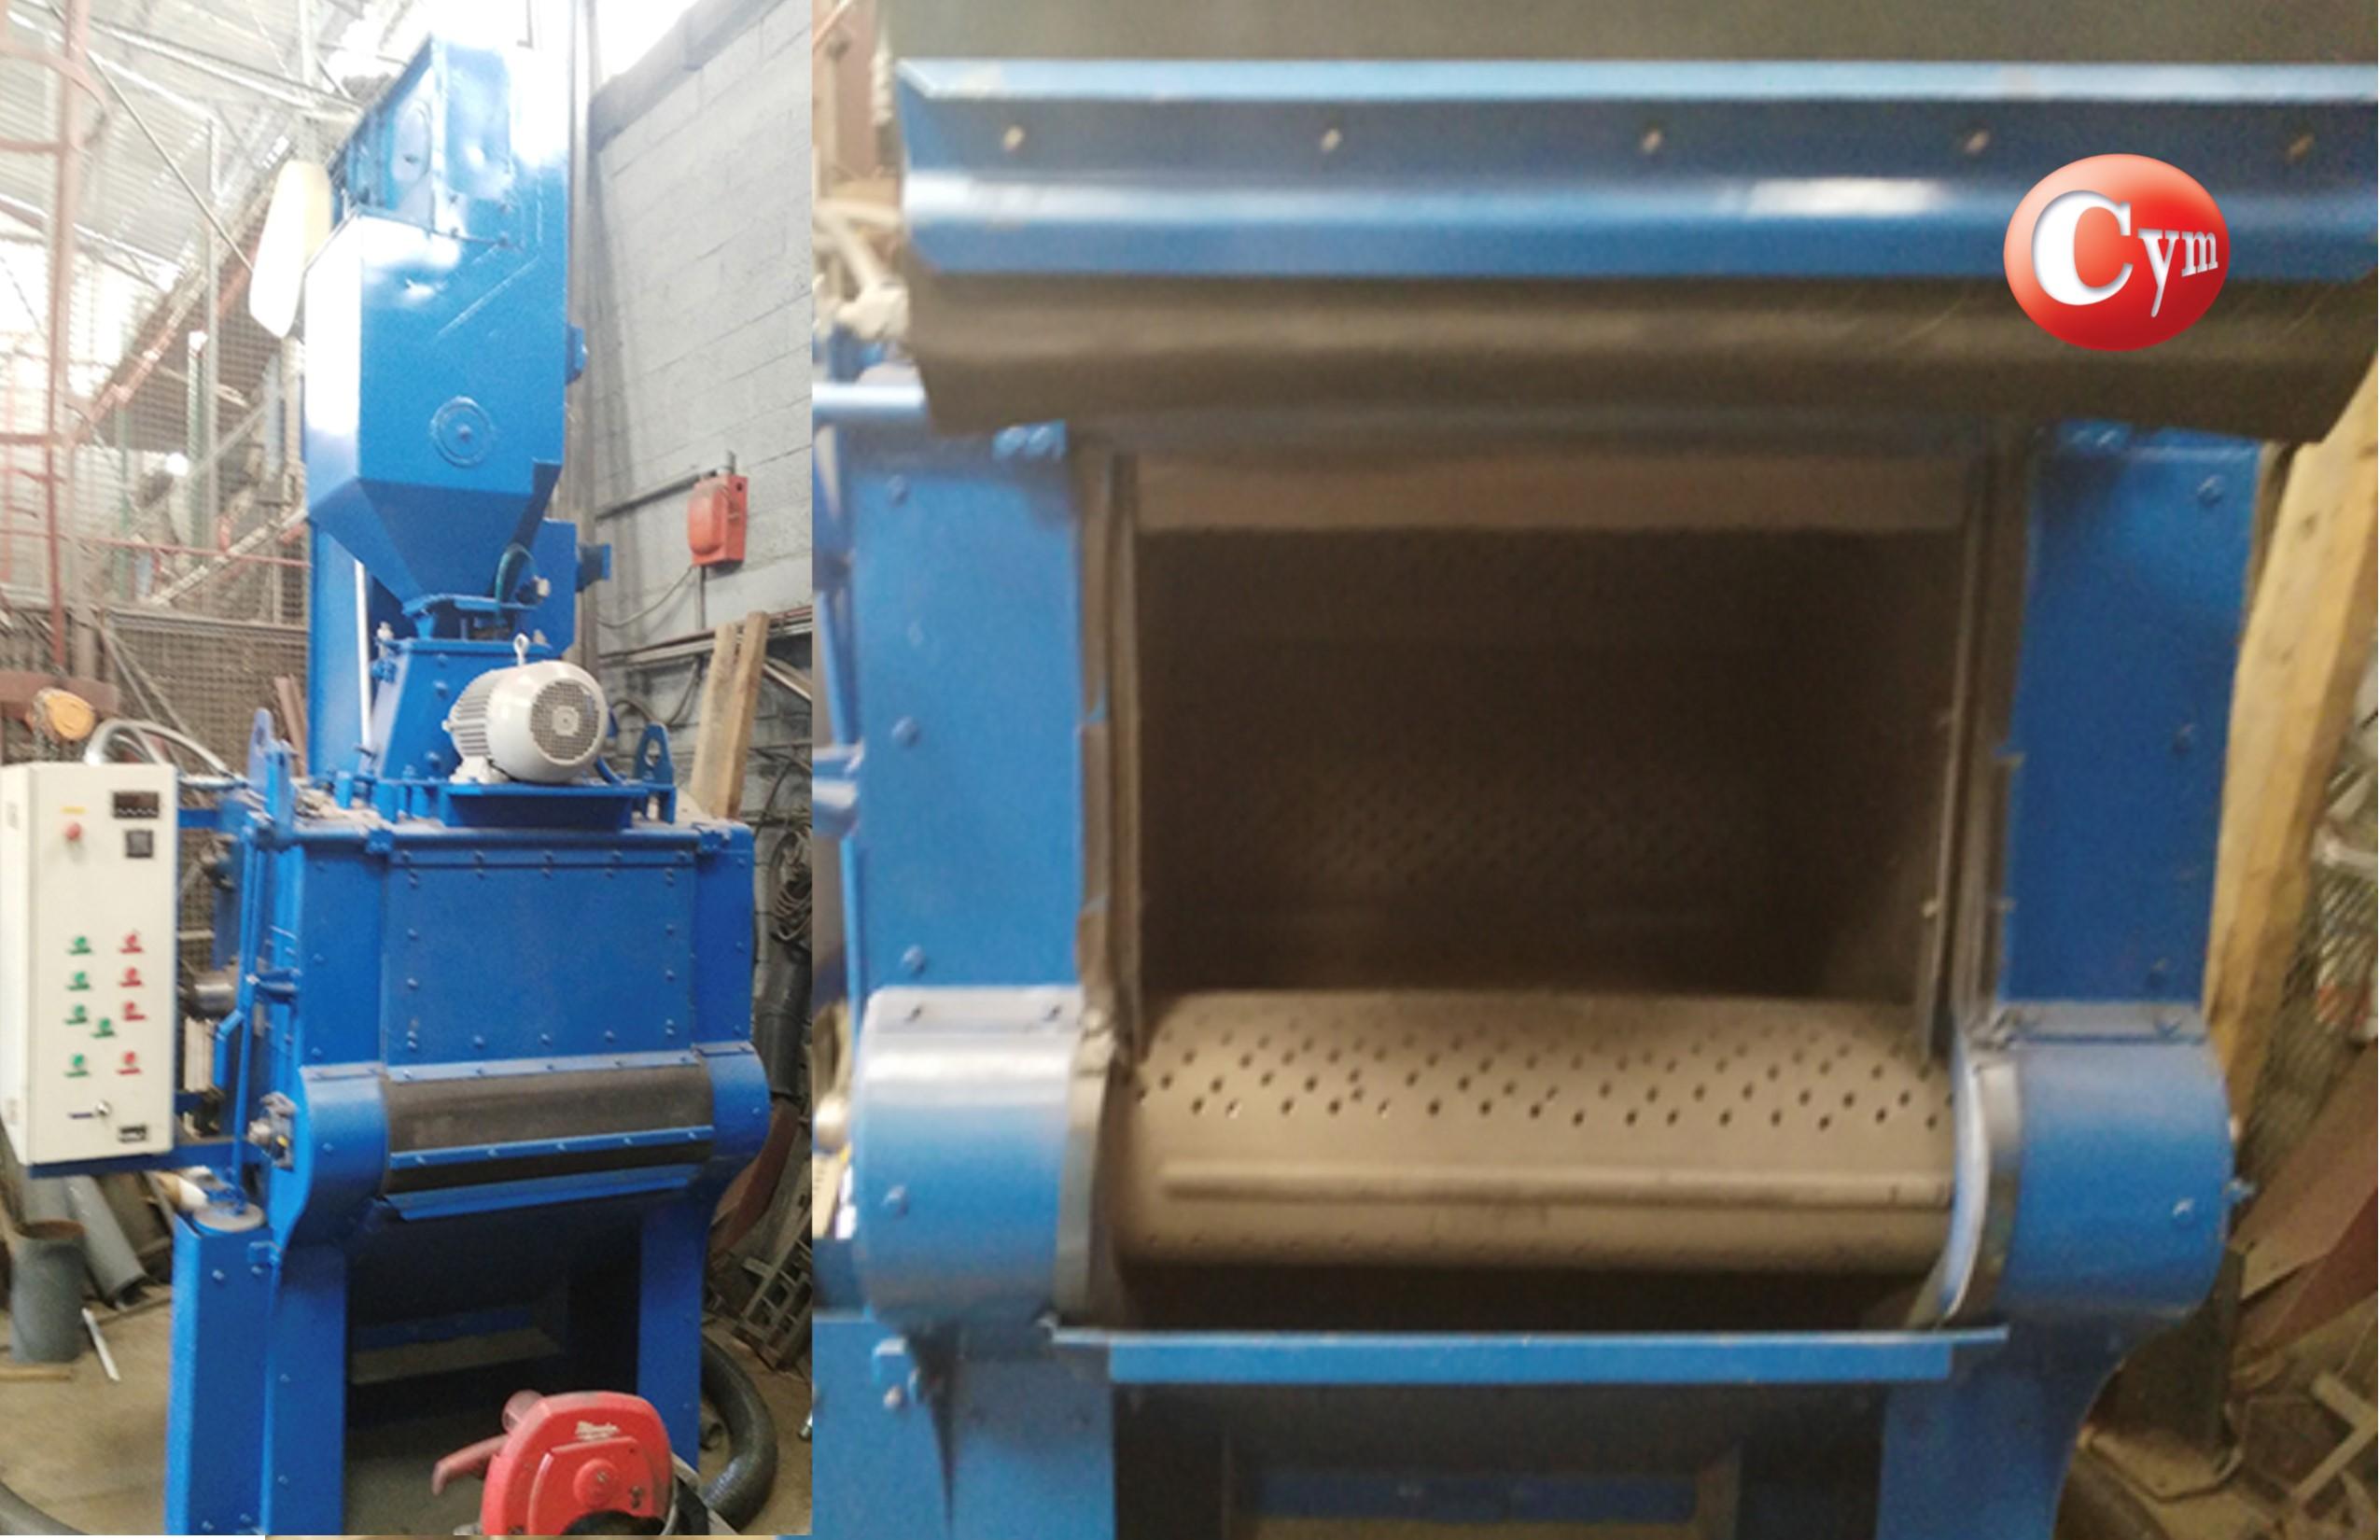 granalladora-wheelabrator-usada-tumblast-20x27-en-venta-en-mexico-cym